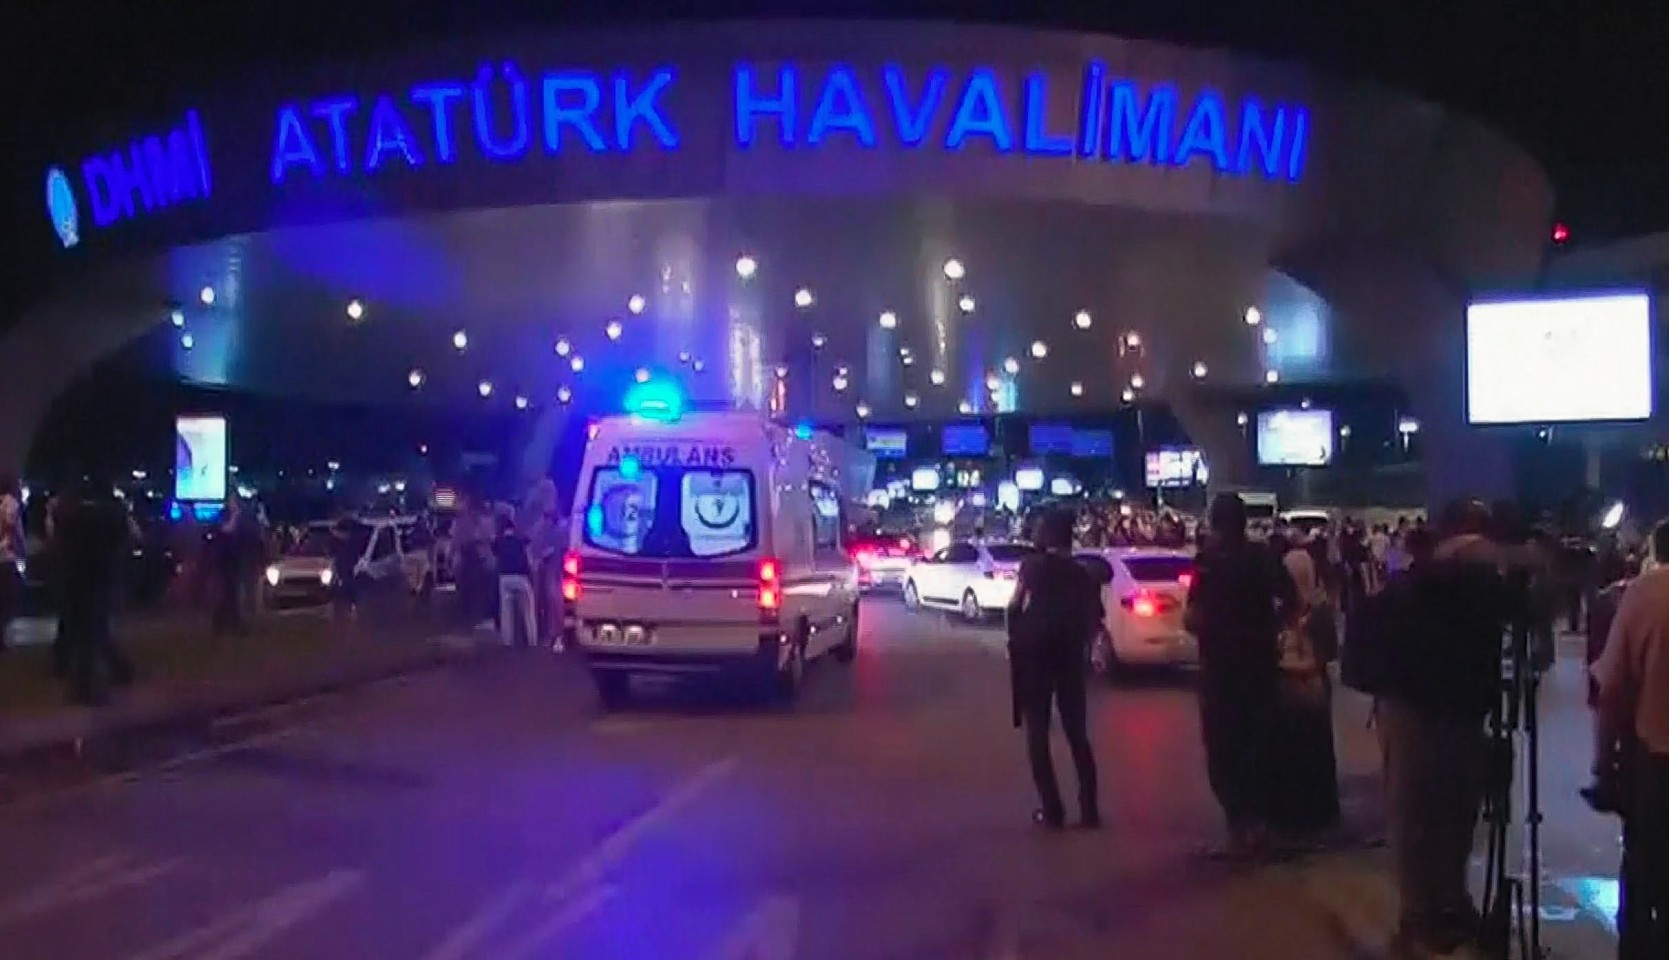 Turkey Istanbul: Explosions and gunfire rock Ataturk airport